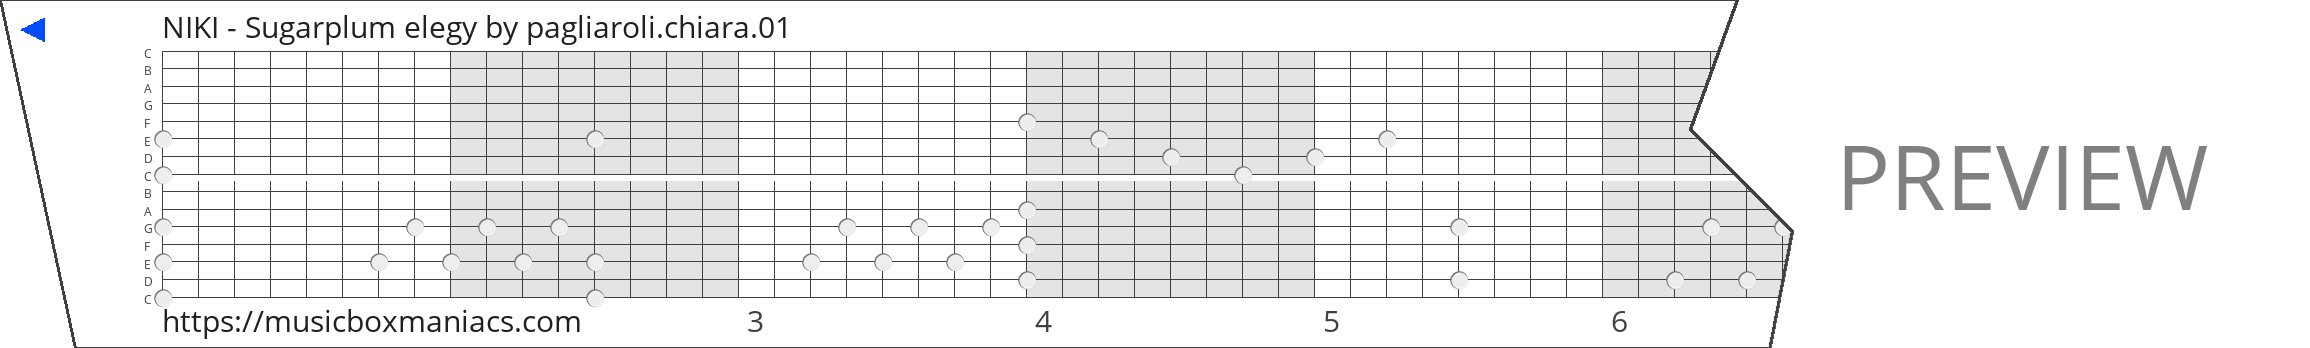 NIKI - Sugarplum elegy 15 note music box paper strip